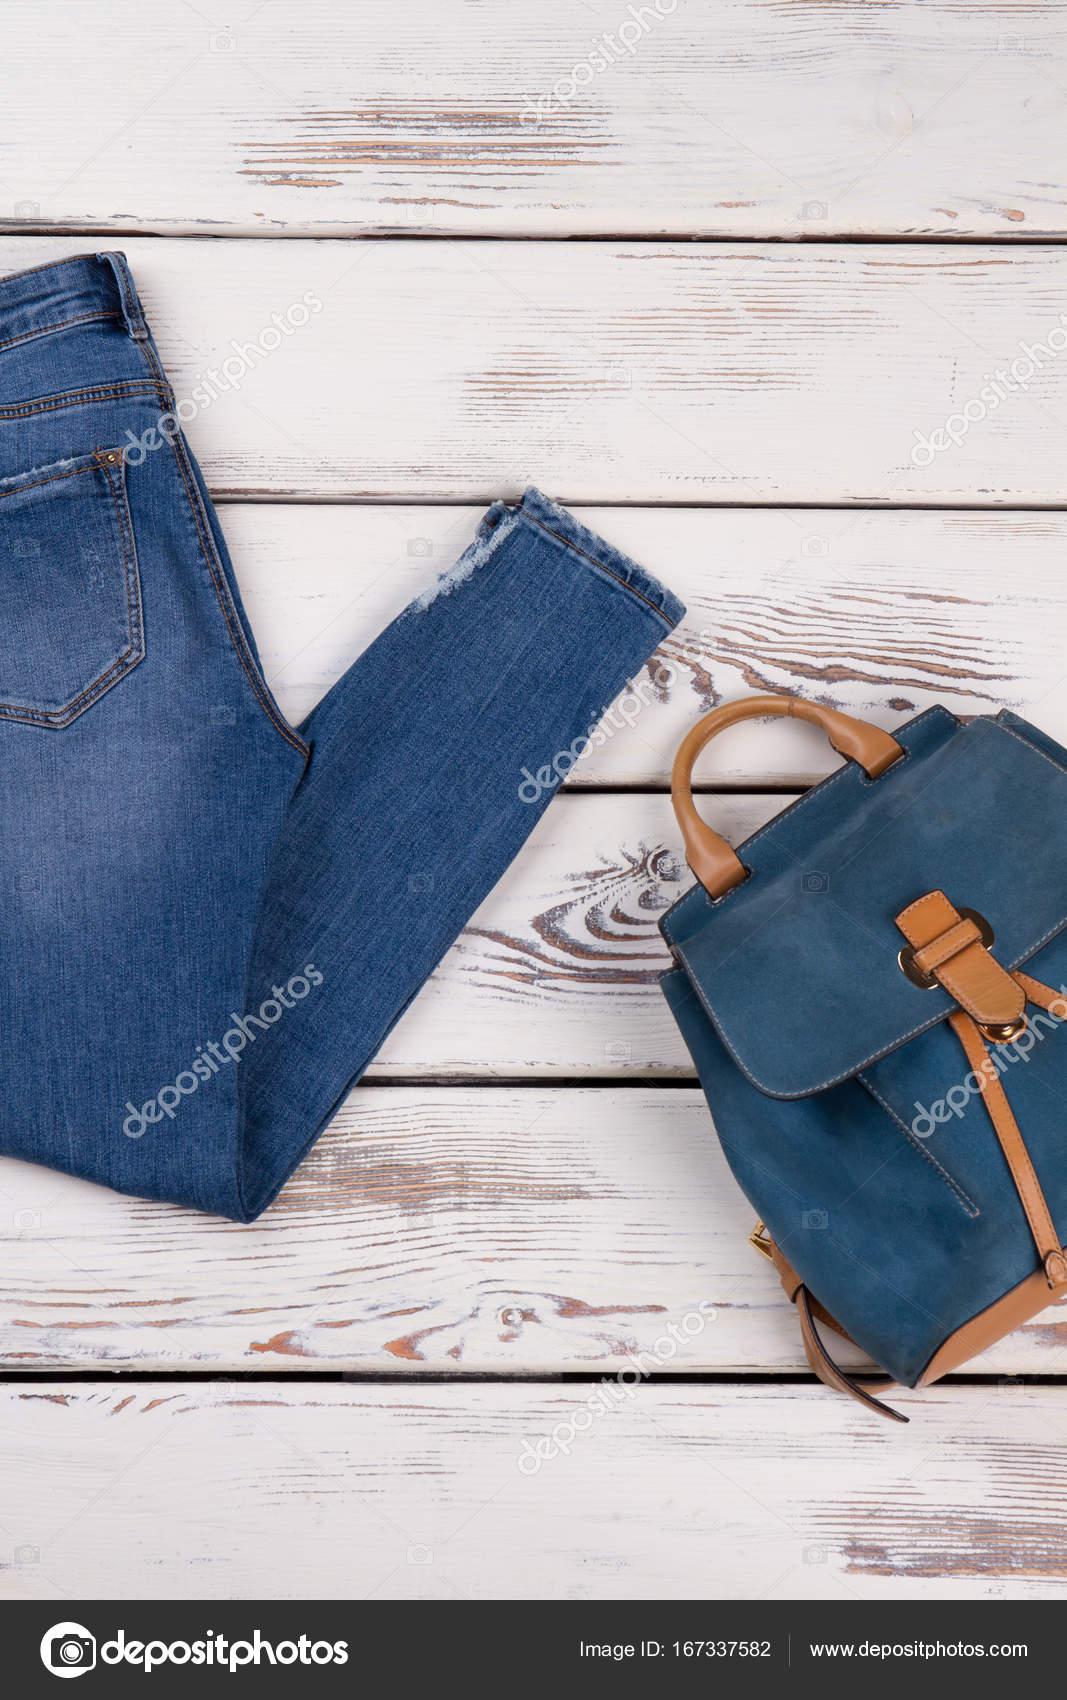 eb6935dee855 Μπλε τζιν και δερμάτινη τσάντα σε ξύλινο πάτωμα. Σετ μοντέρνα ρούχα.  Λεπτομέρειες των γυναικών καθημερινά look — Εικόνα από margostock